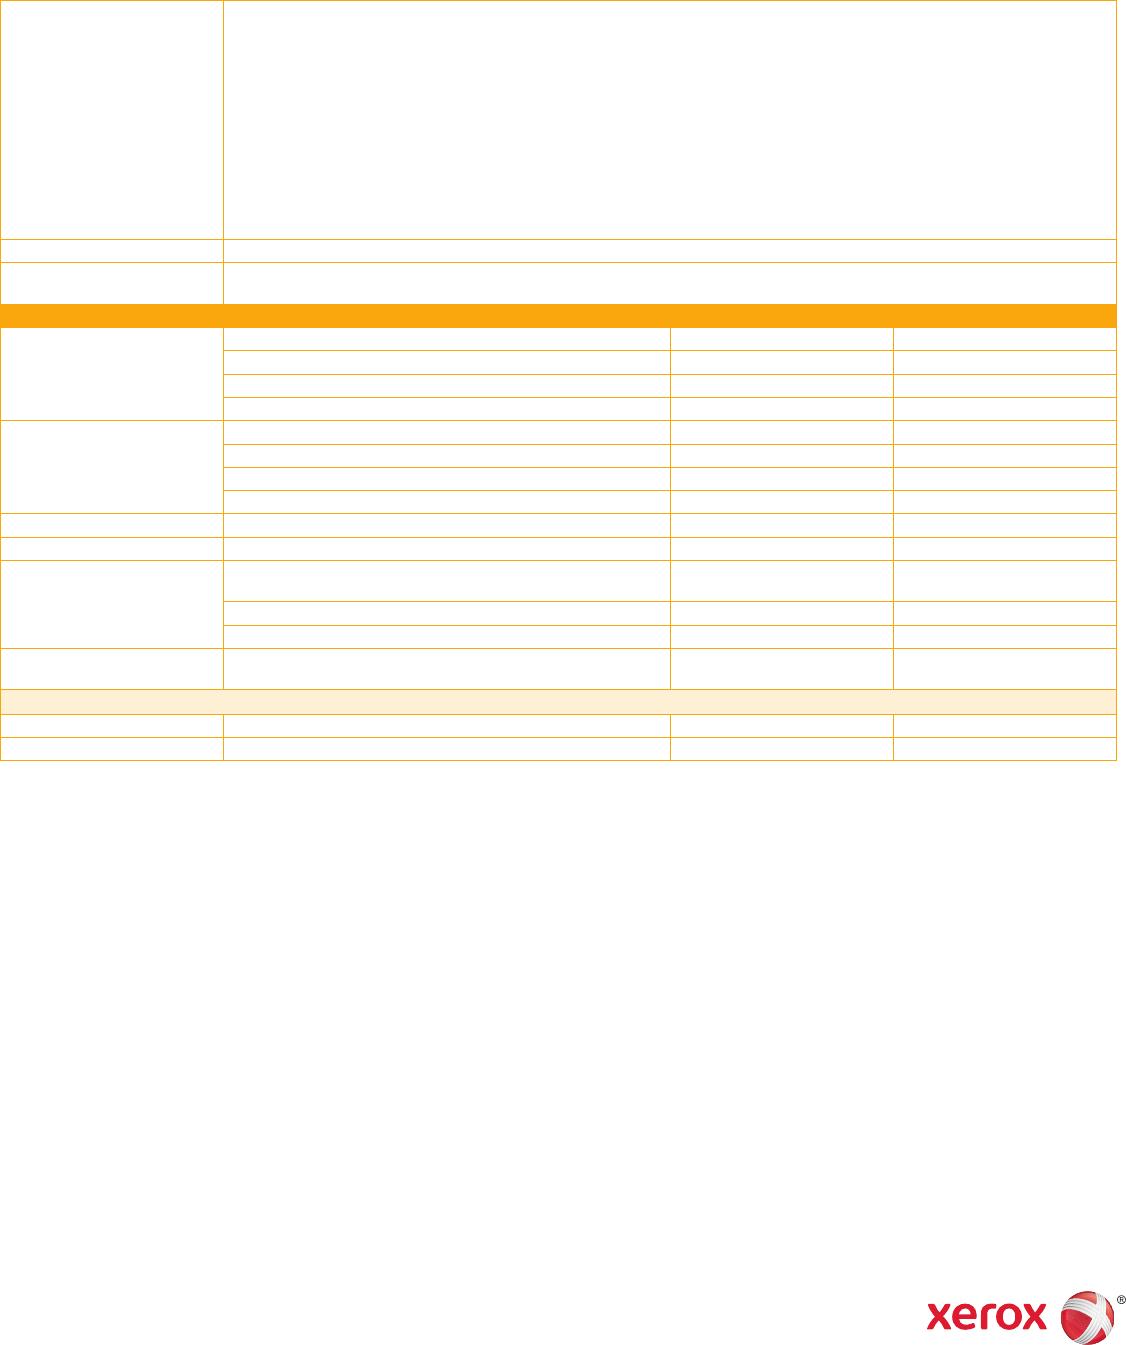 Xerox 7530 drivers windows 7 | XEROX WORKCENTRE 7535 PRINTER